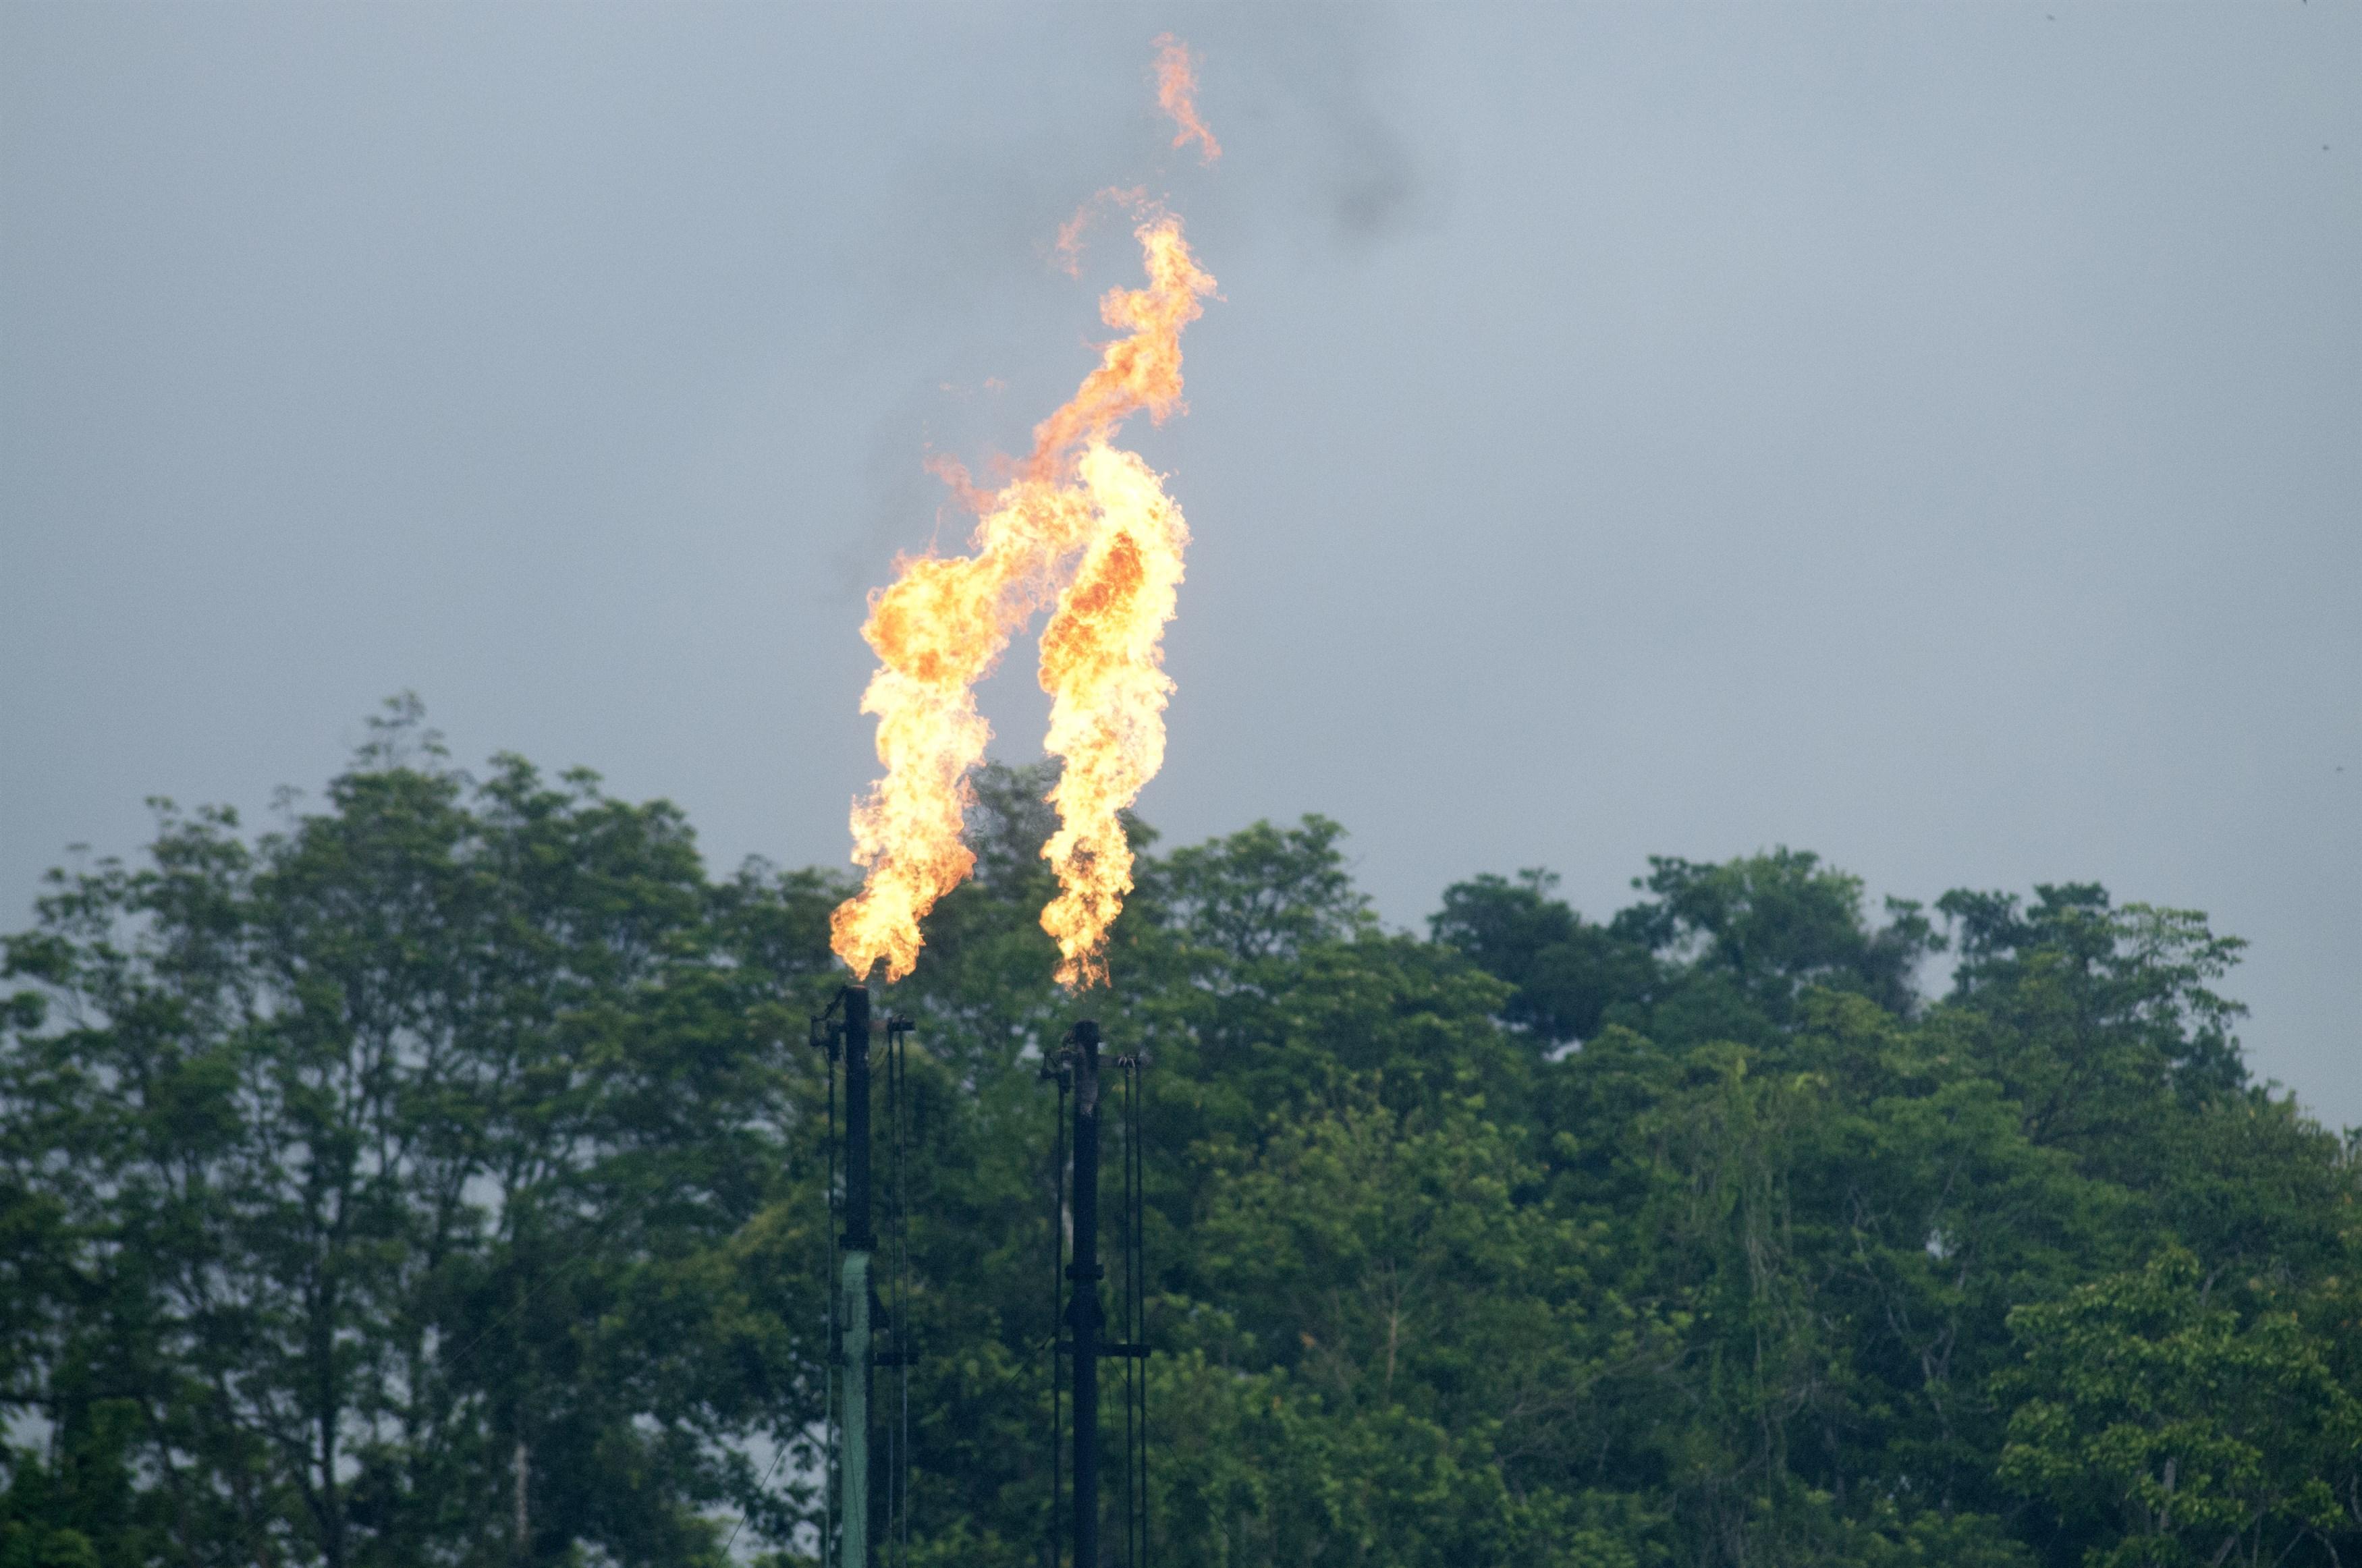 gas-flaring-at-oil-drilling-site-on-the-napo-river-amazone-ecuador_bc0e-3500x2324px